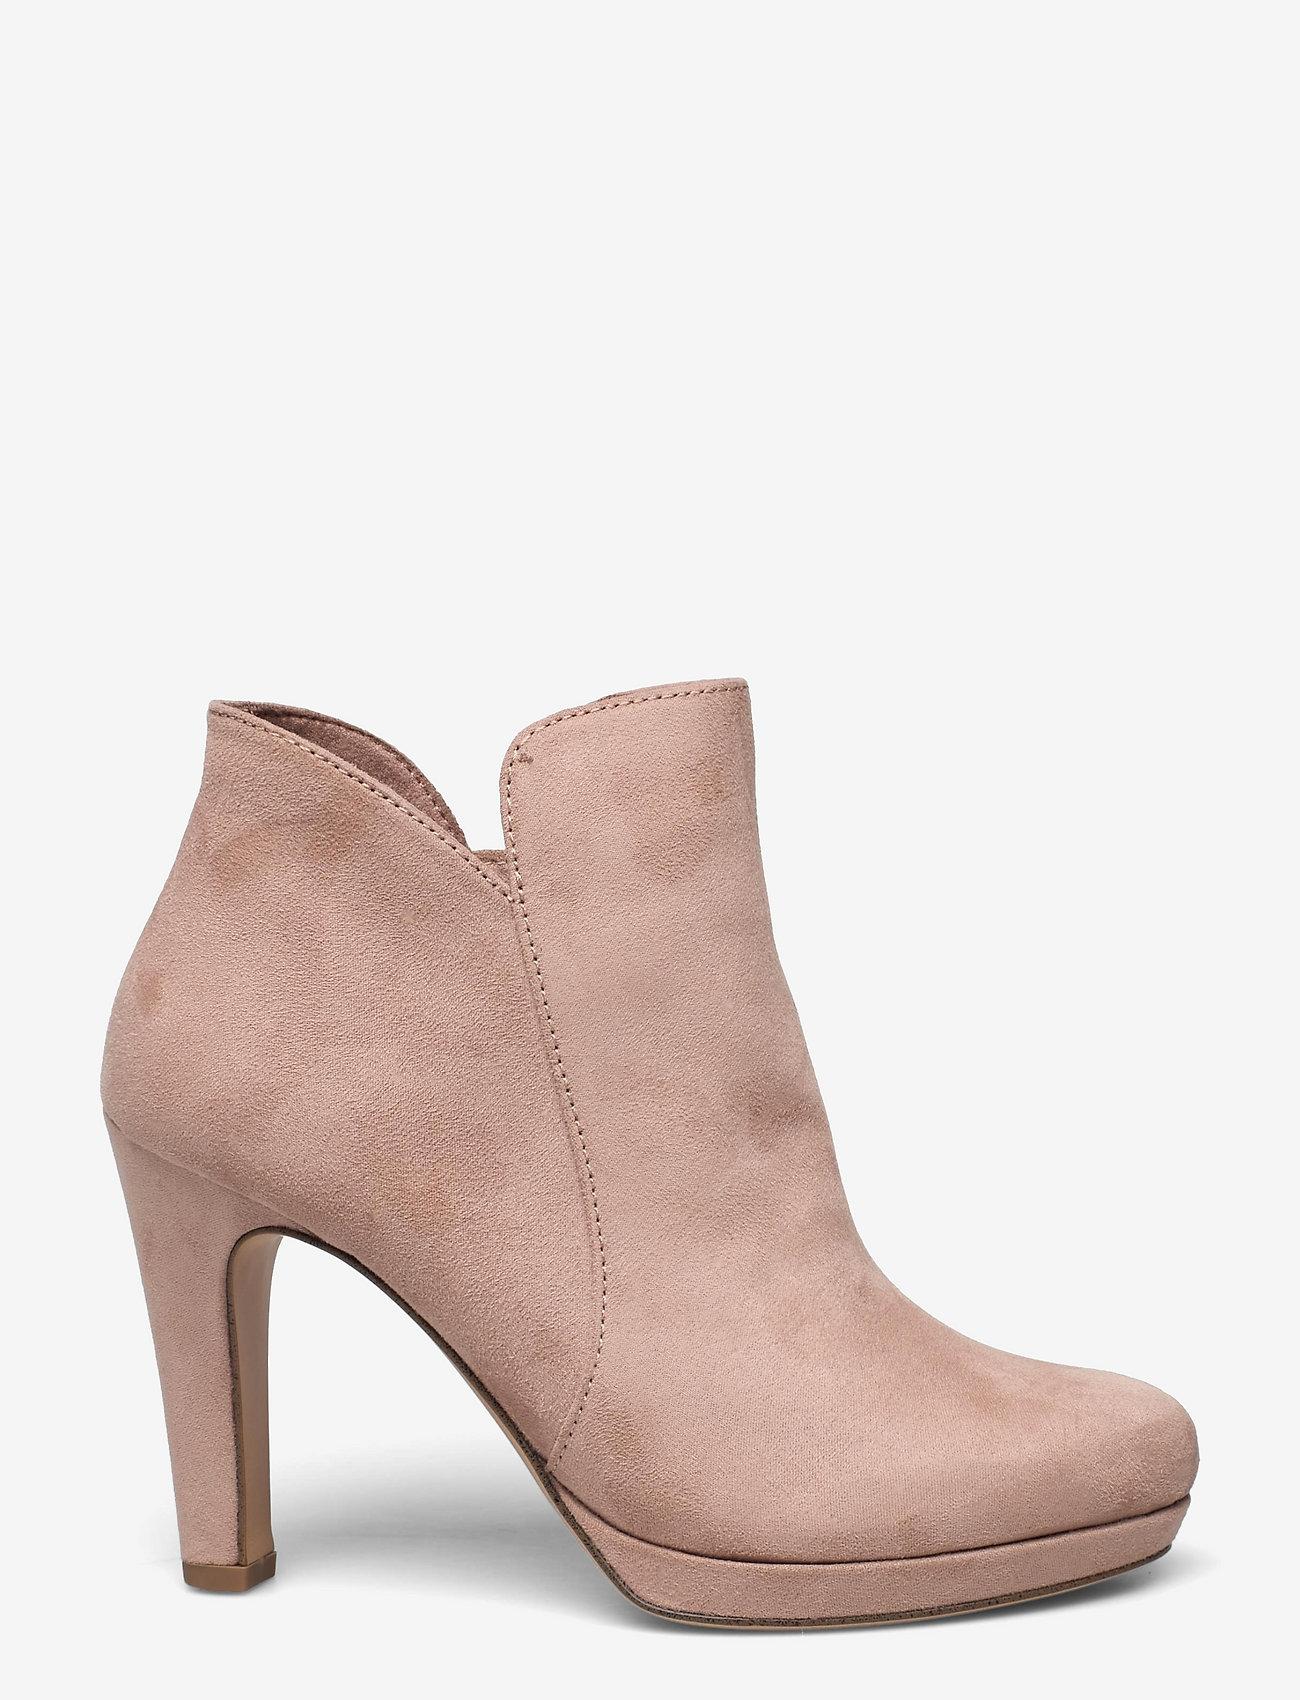 Tamaris - Woms Boots - Lycoris - augstpapēžu puszābaki - old rose - 1